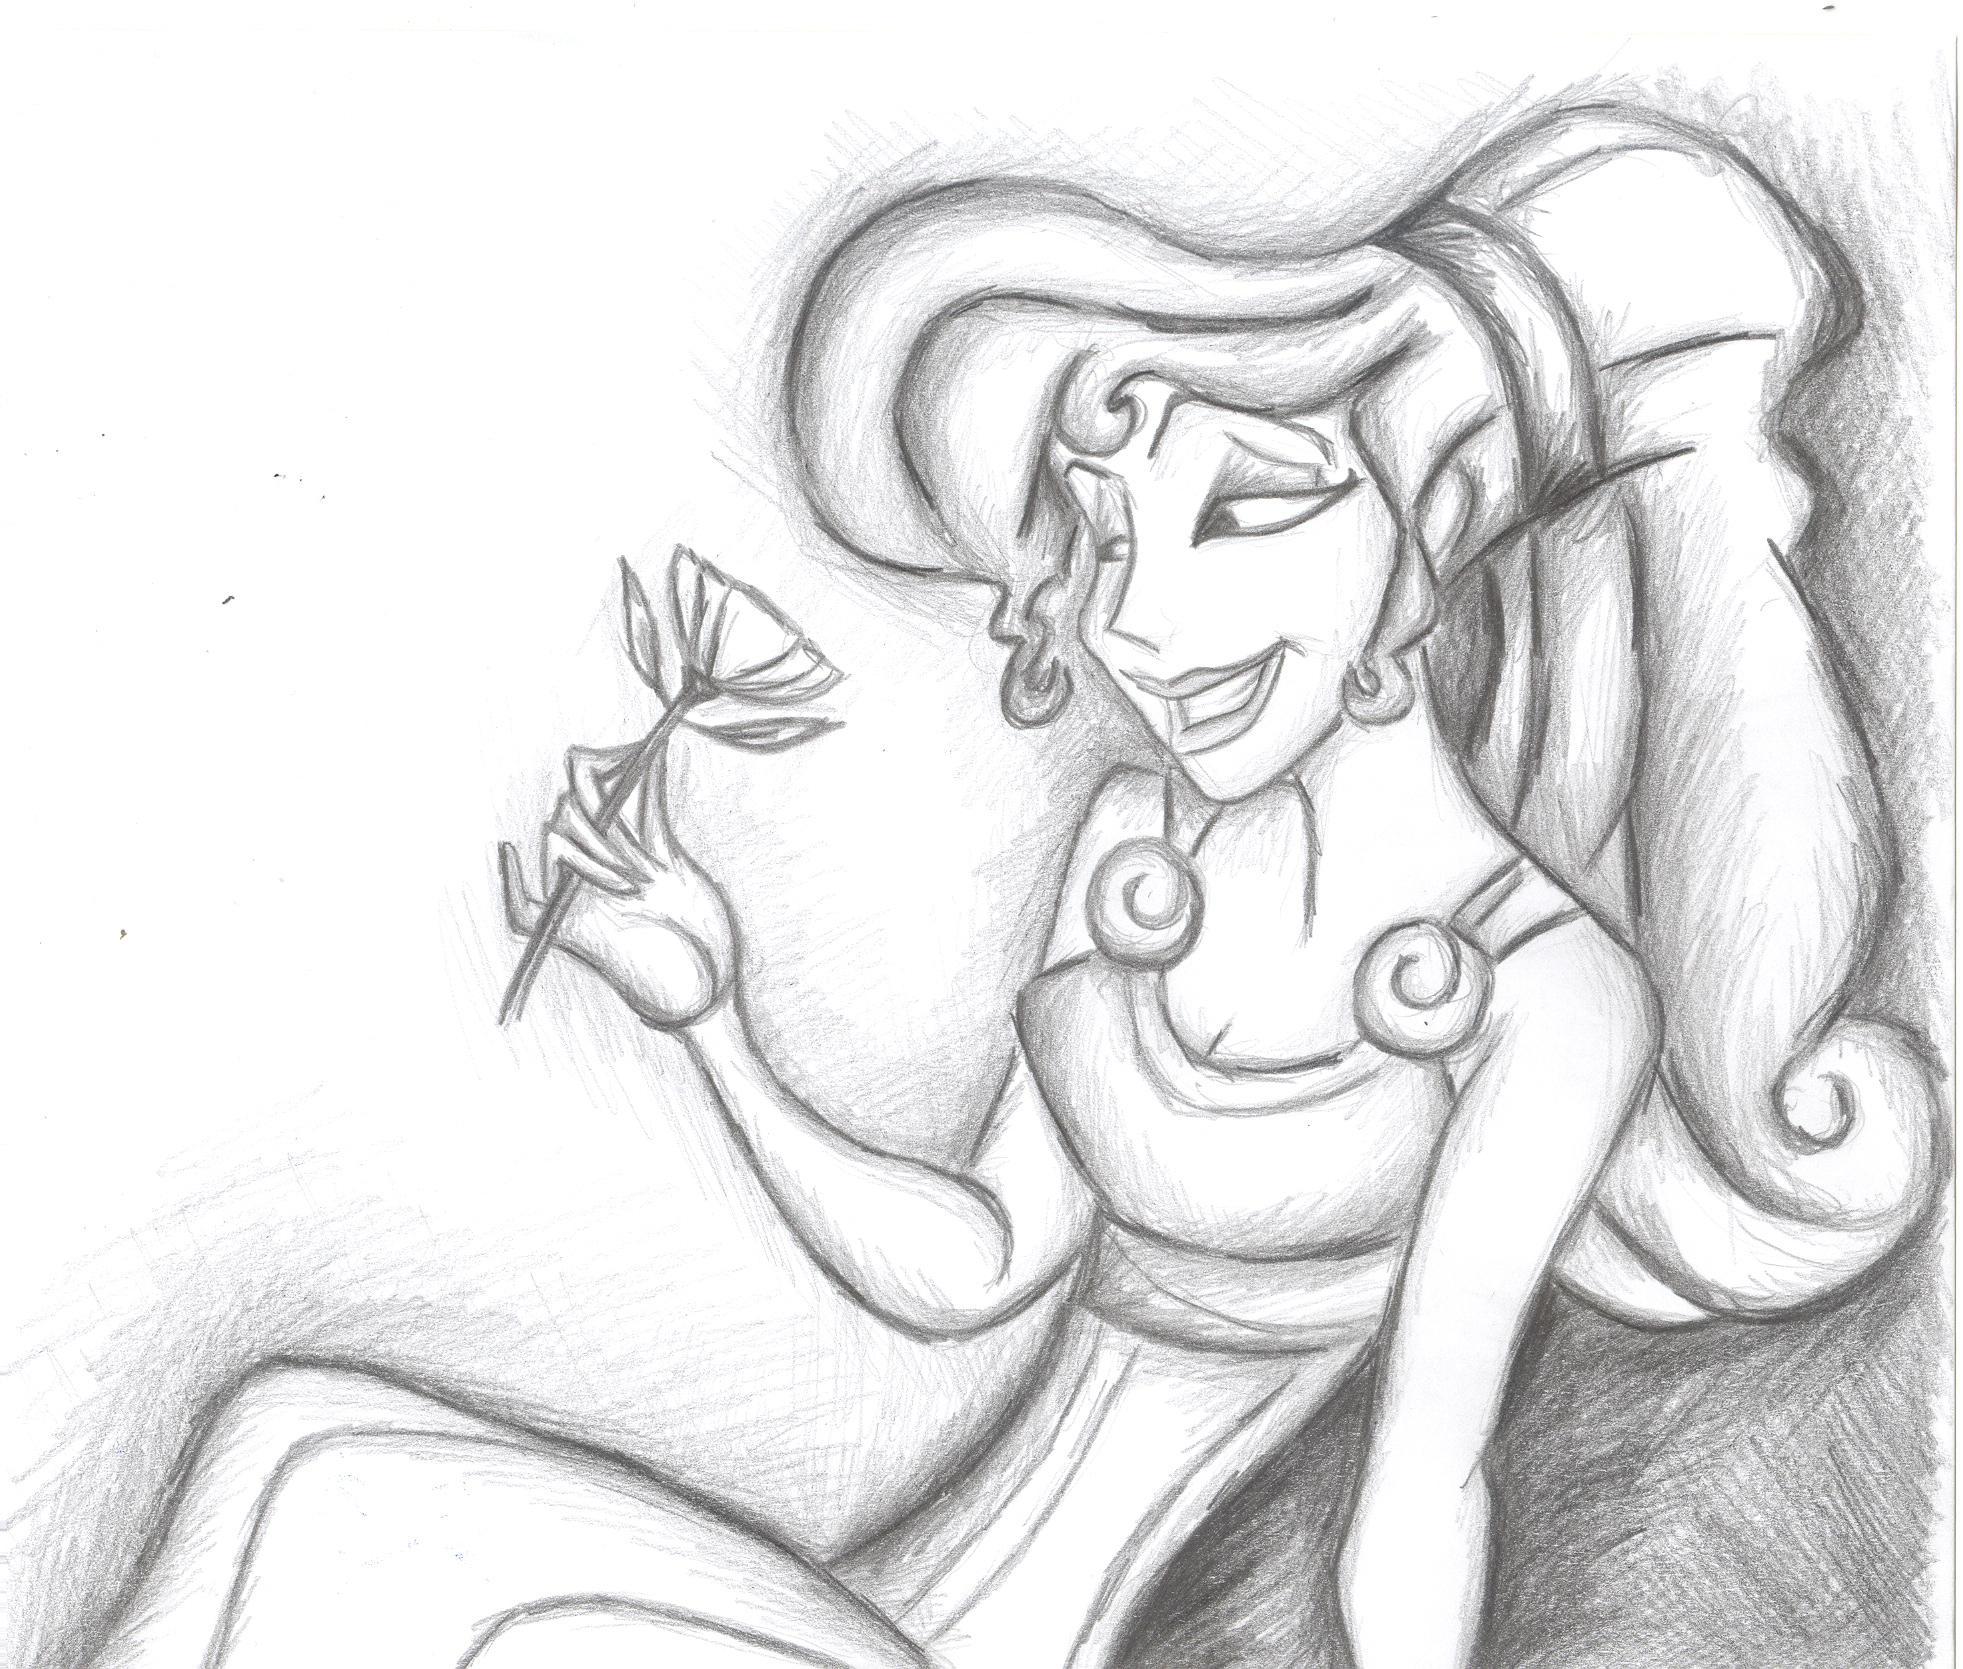 Megara from Disney's Hercules by AlwaysSlightlyHazy